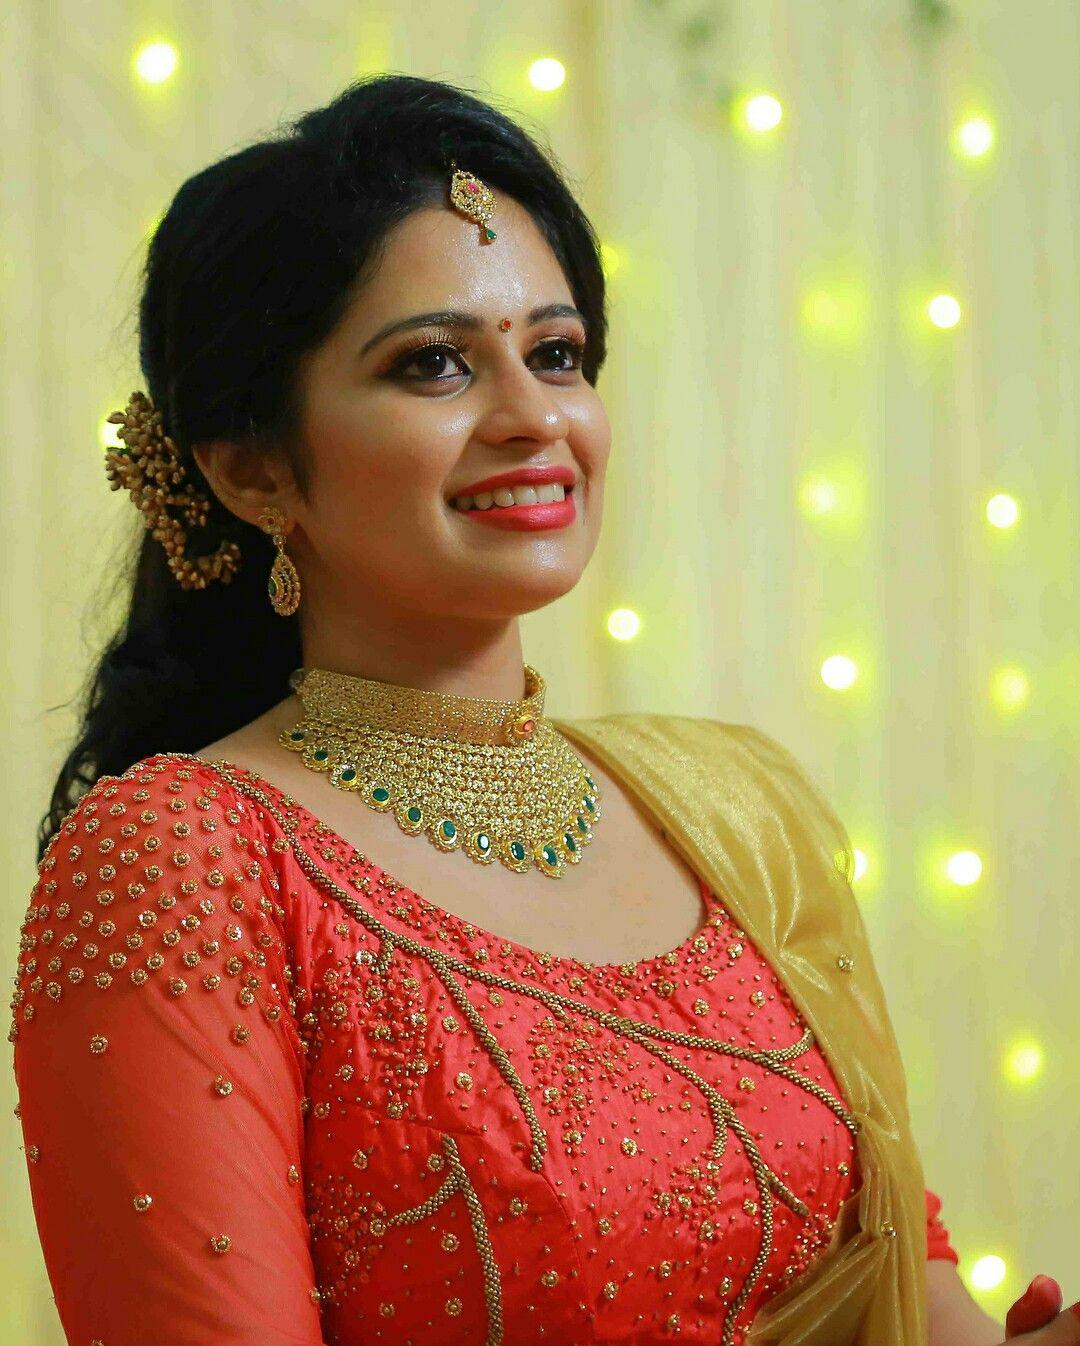 Kerala Wedding Bridal Images: Wedding Dress/ Bride Maid/ Gowns